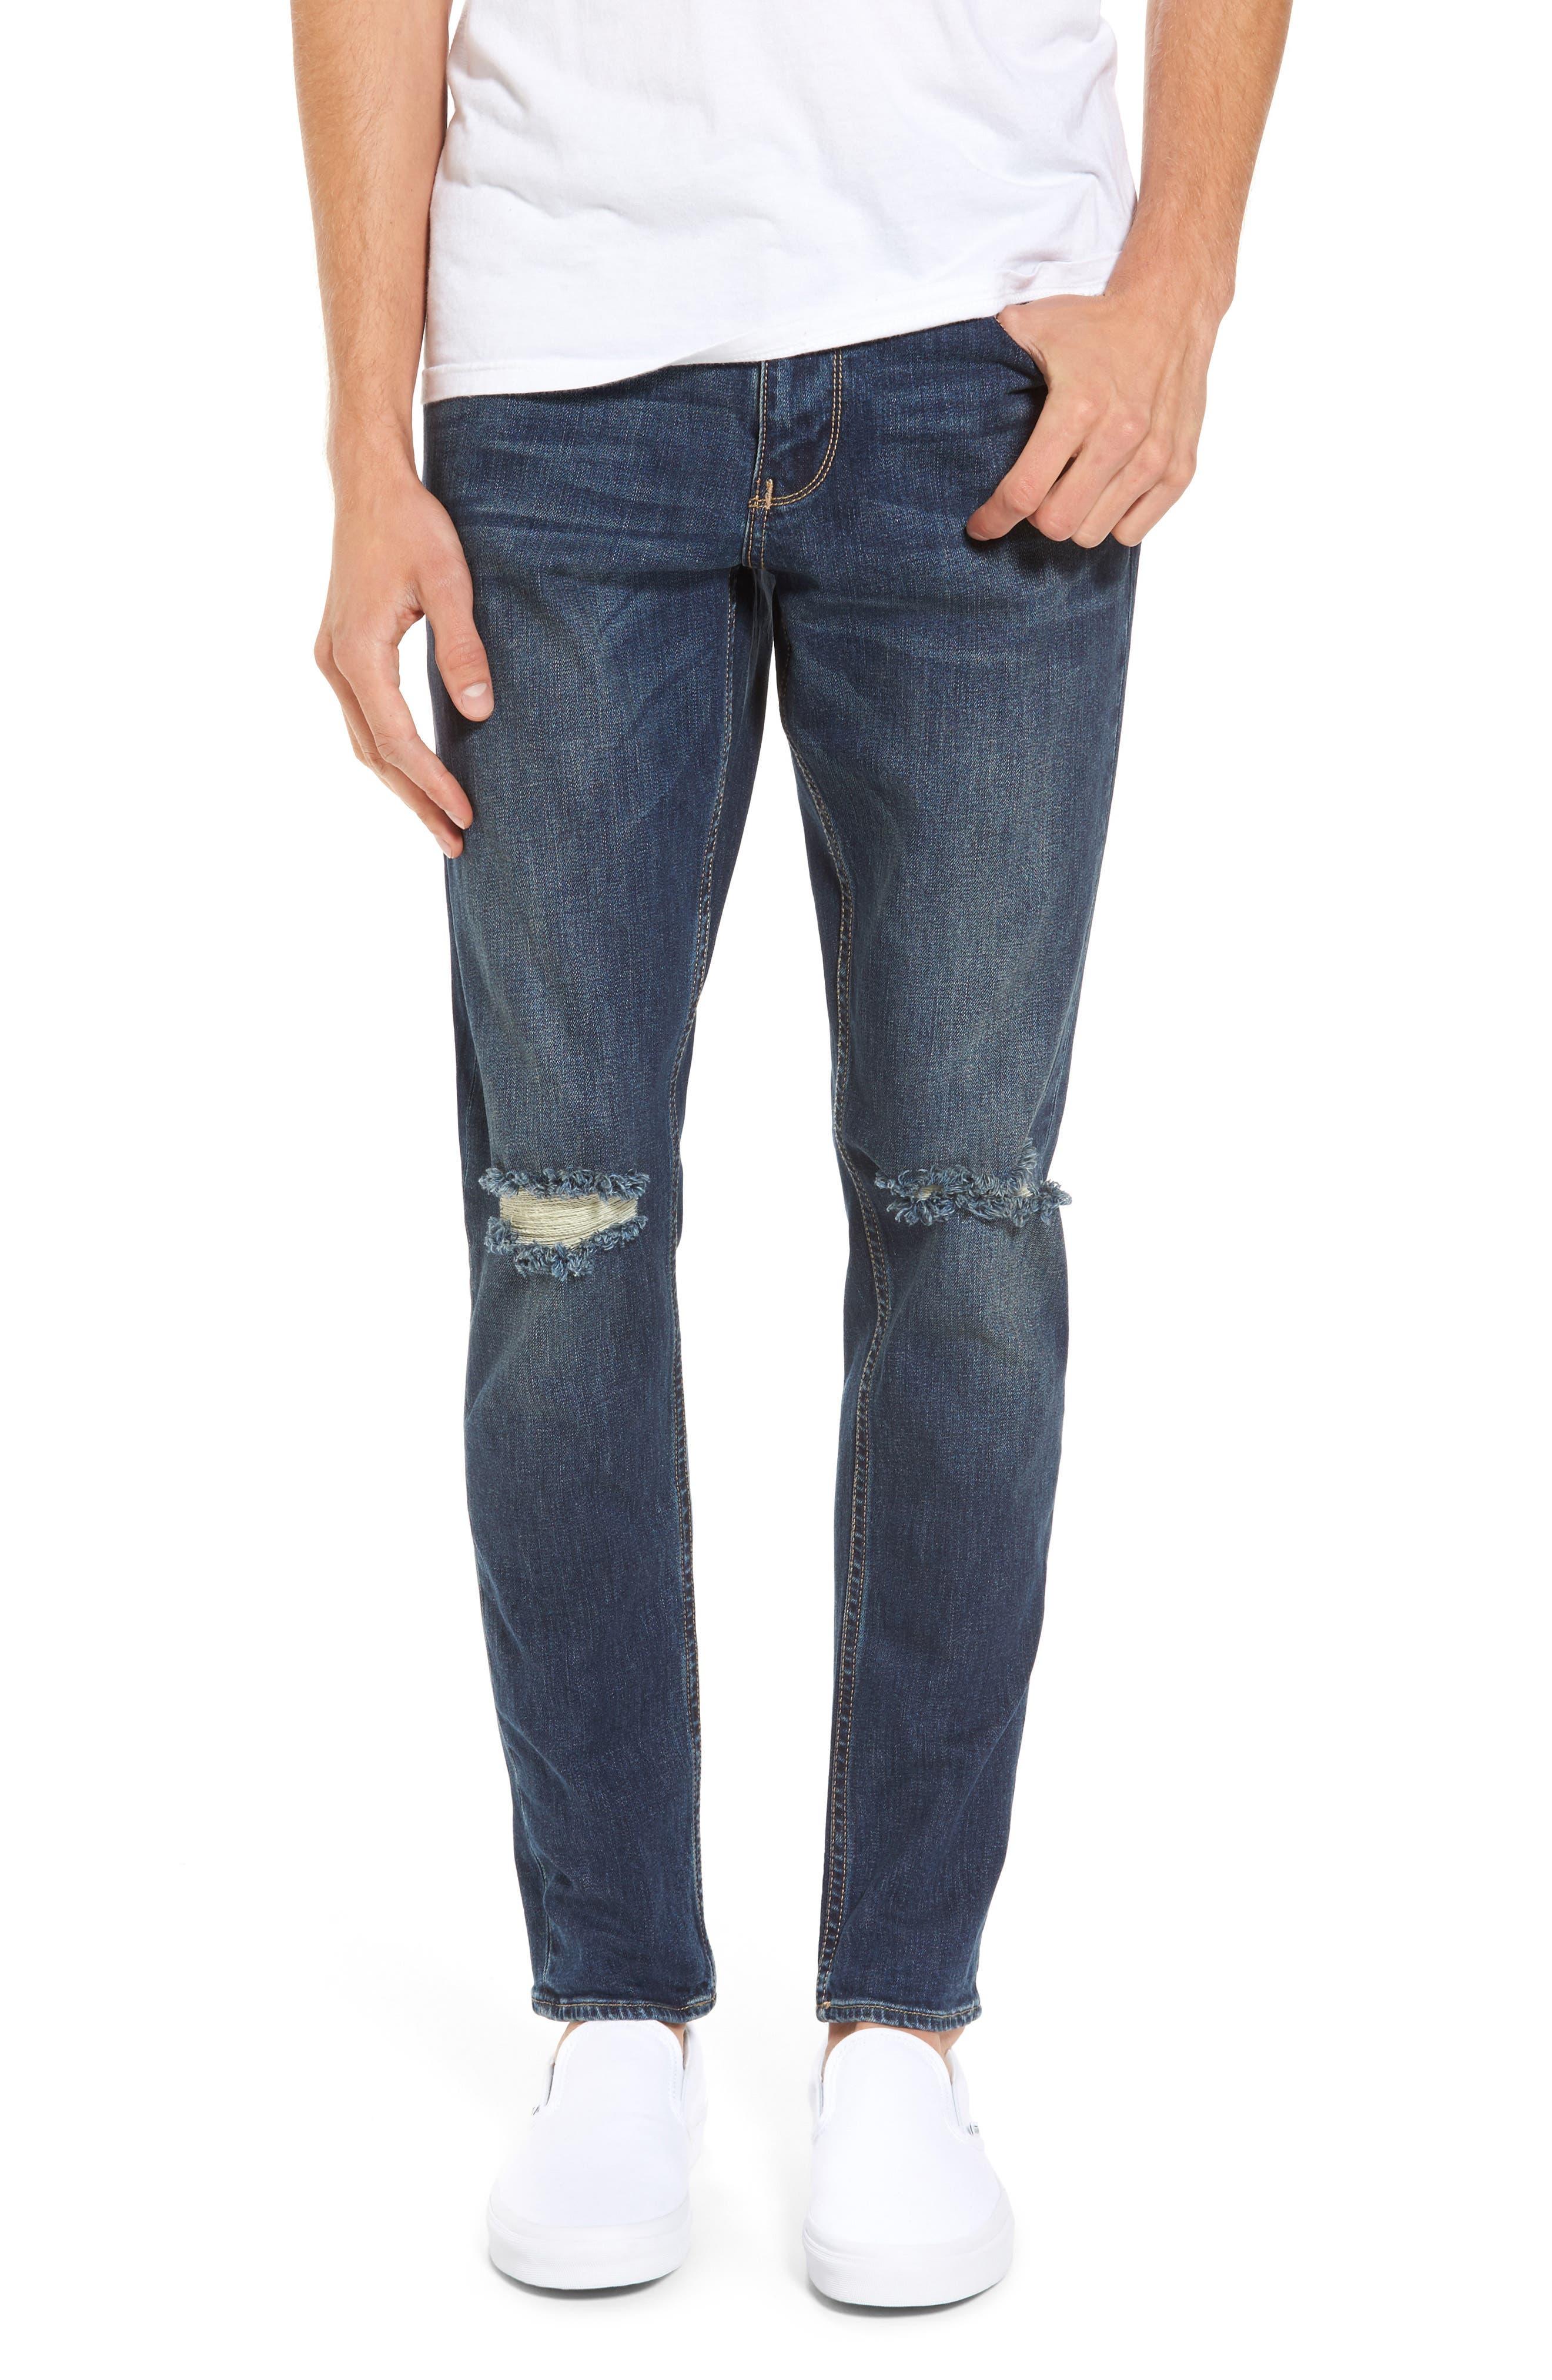 Alternate Image 1 Selected - Treasure & Bond Slim Fit Destroyed Jeans